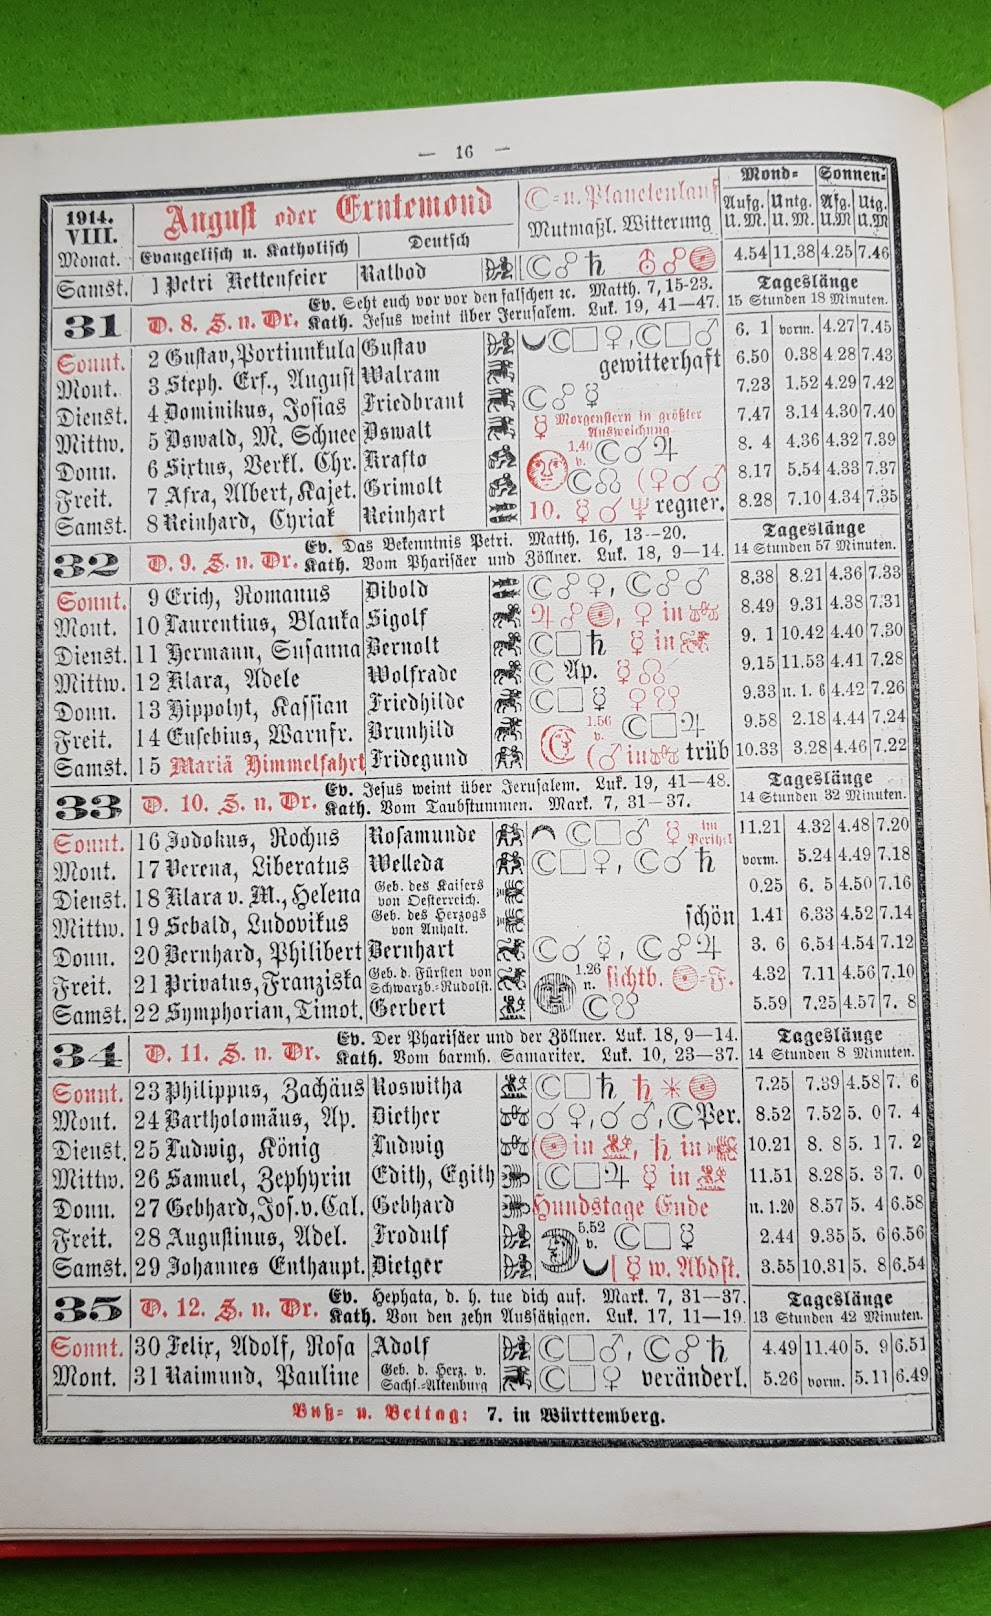 Großer Volkskalender des Lahrer hinkenden Boten - 1914 - August